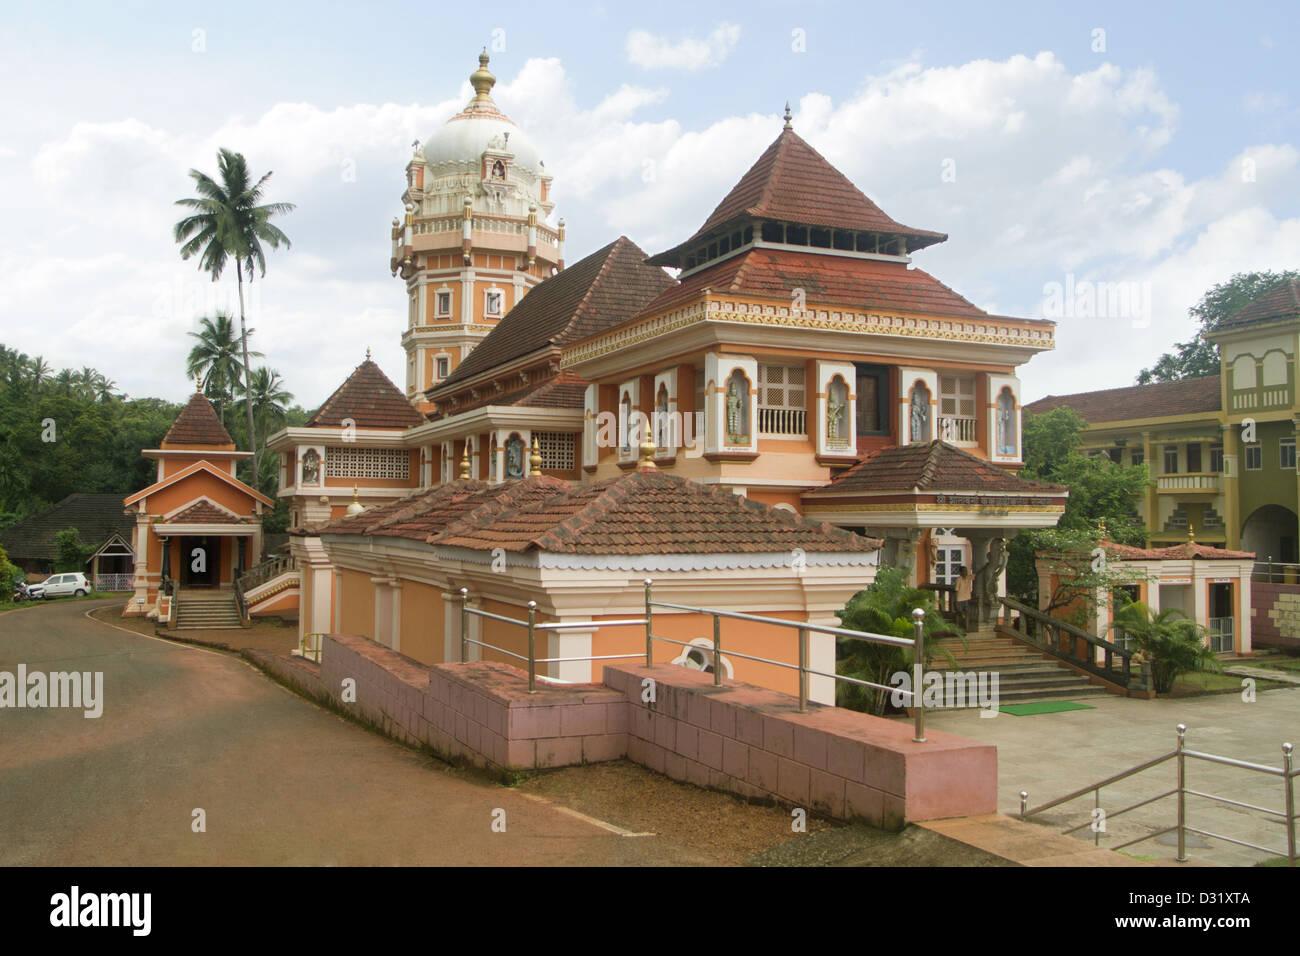 Shri Devi Shantadurga tempio, 33 km da Panaji al foothill del villaggio Kavalem in Ponda Taluka, Goa, India Foto Stock